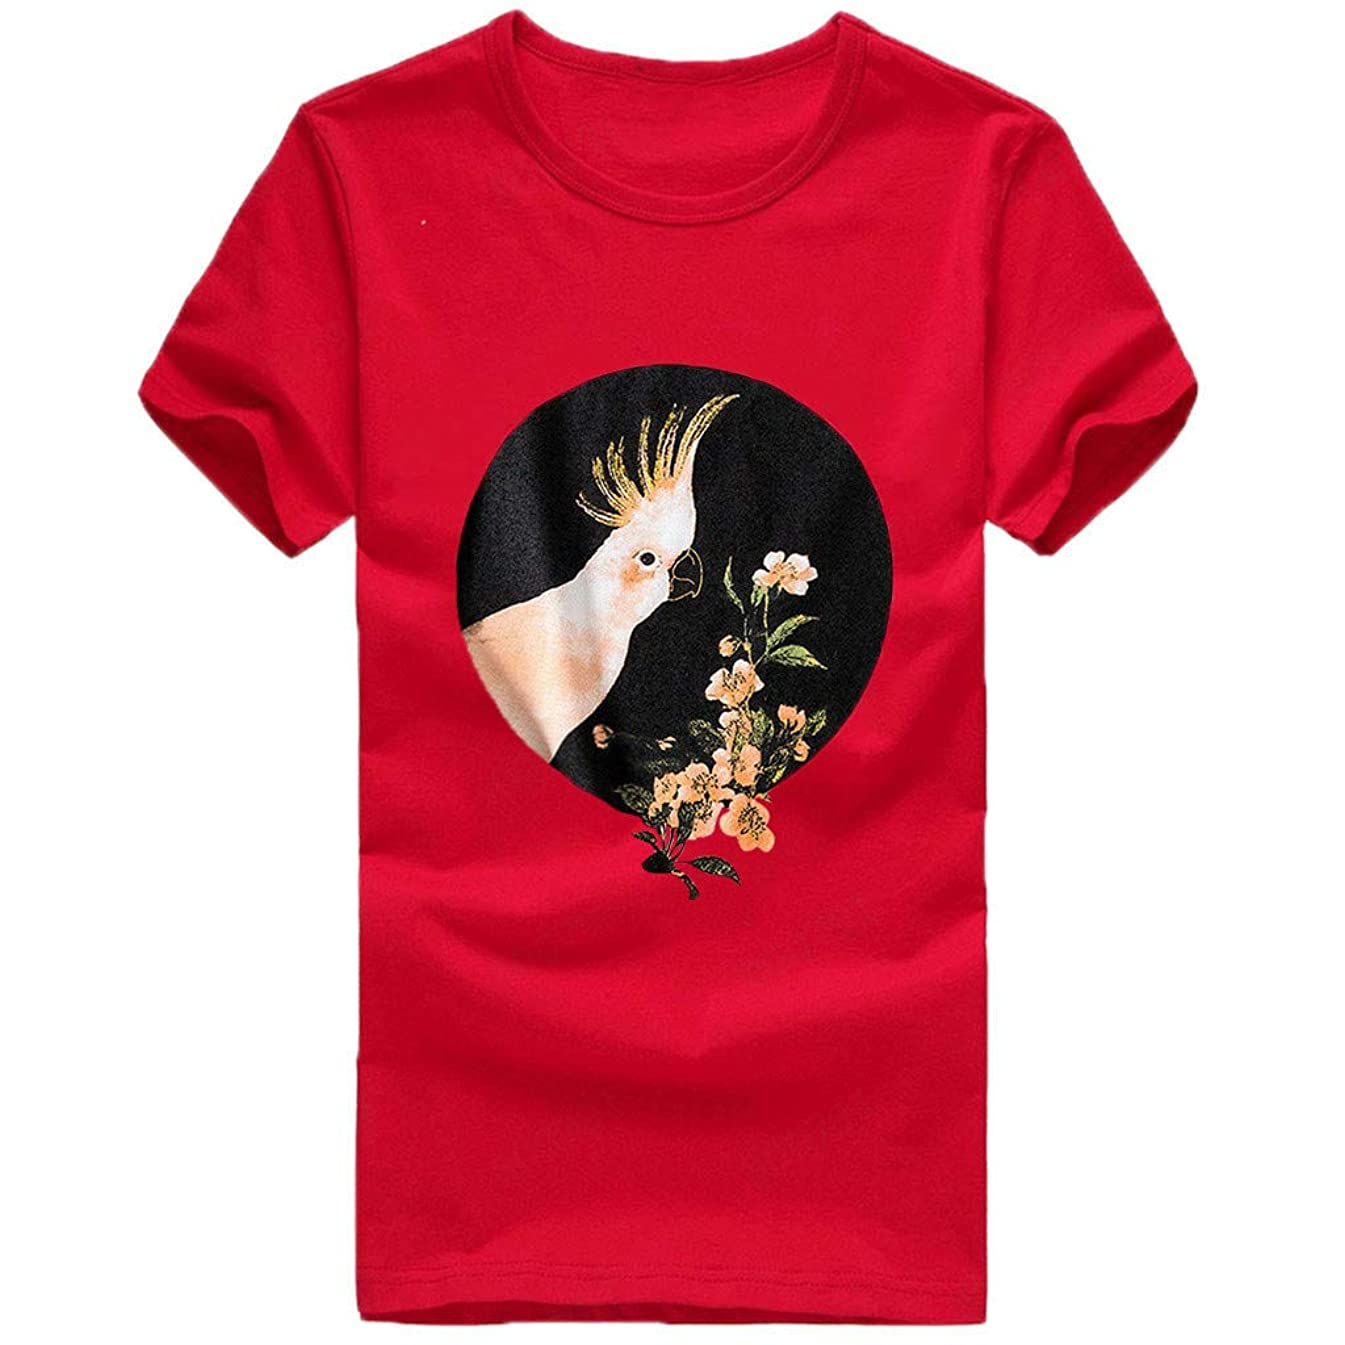 Sumen Women T Shirt Funny Print Short Sleeve Tops Teen Girls Summer Baggy Tees